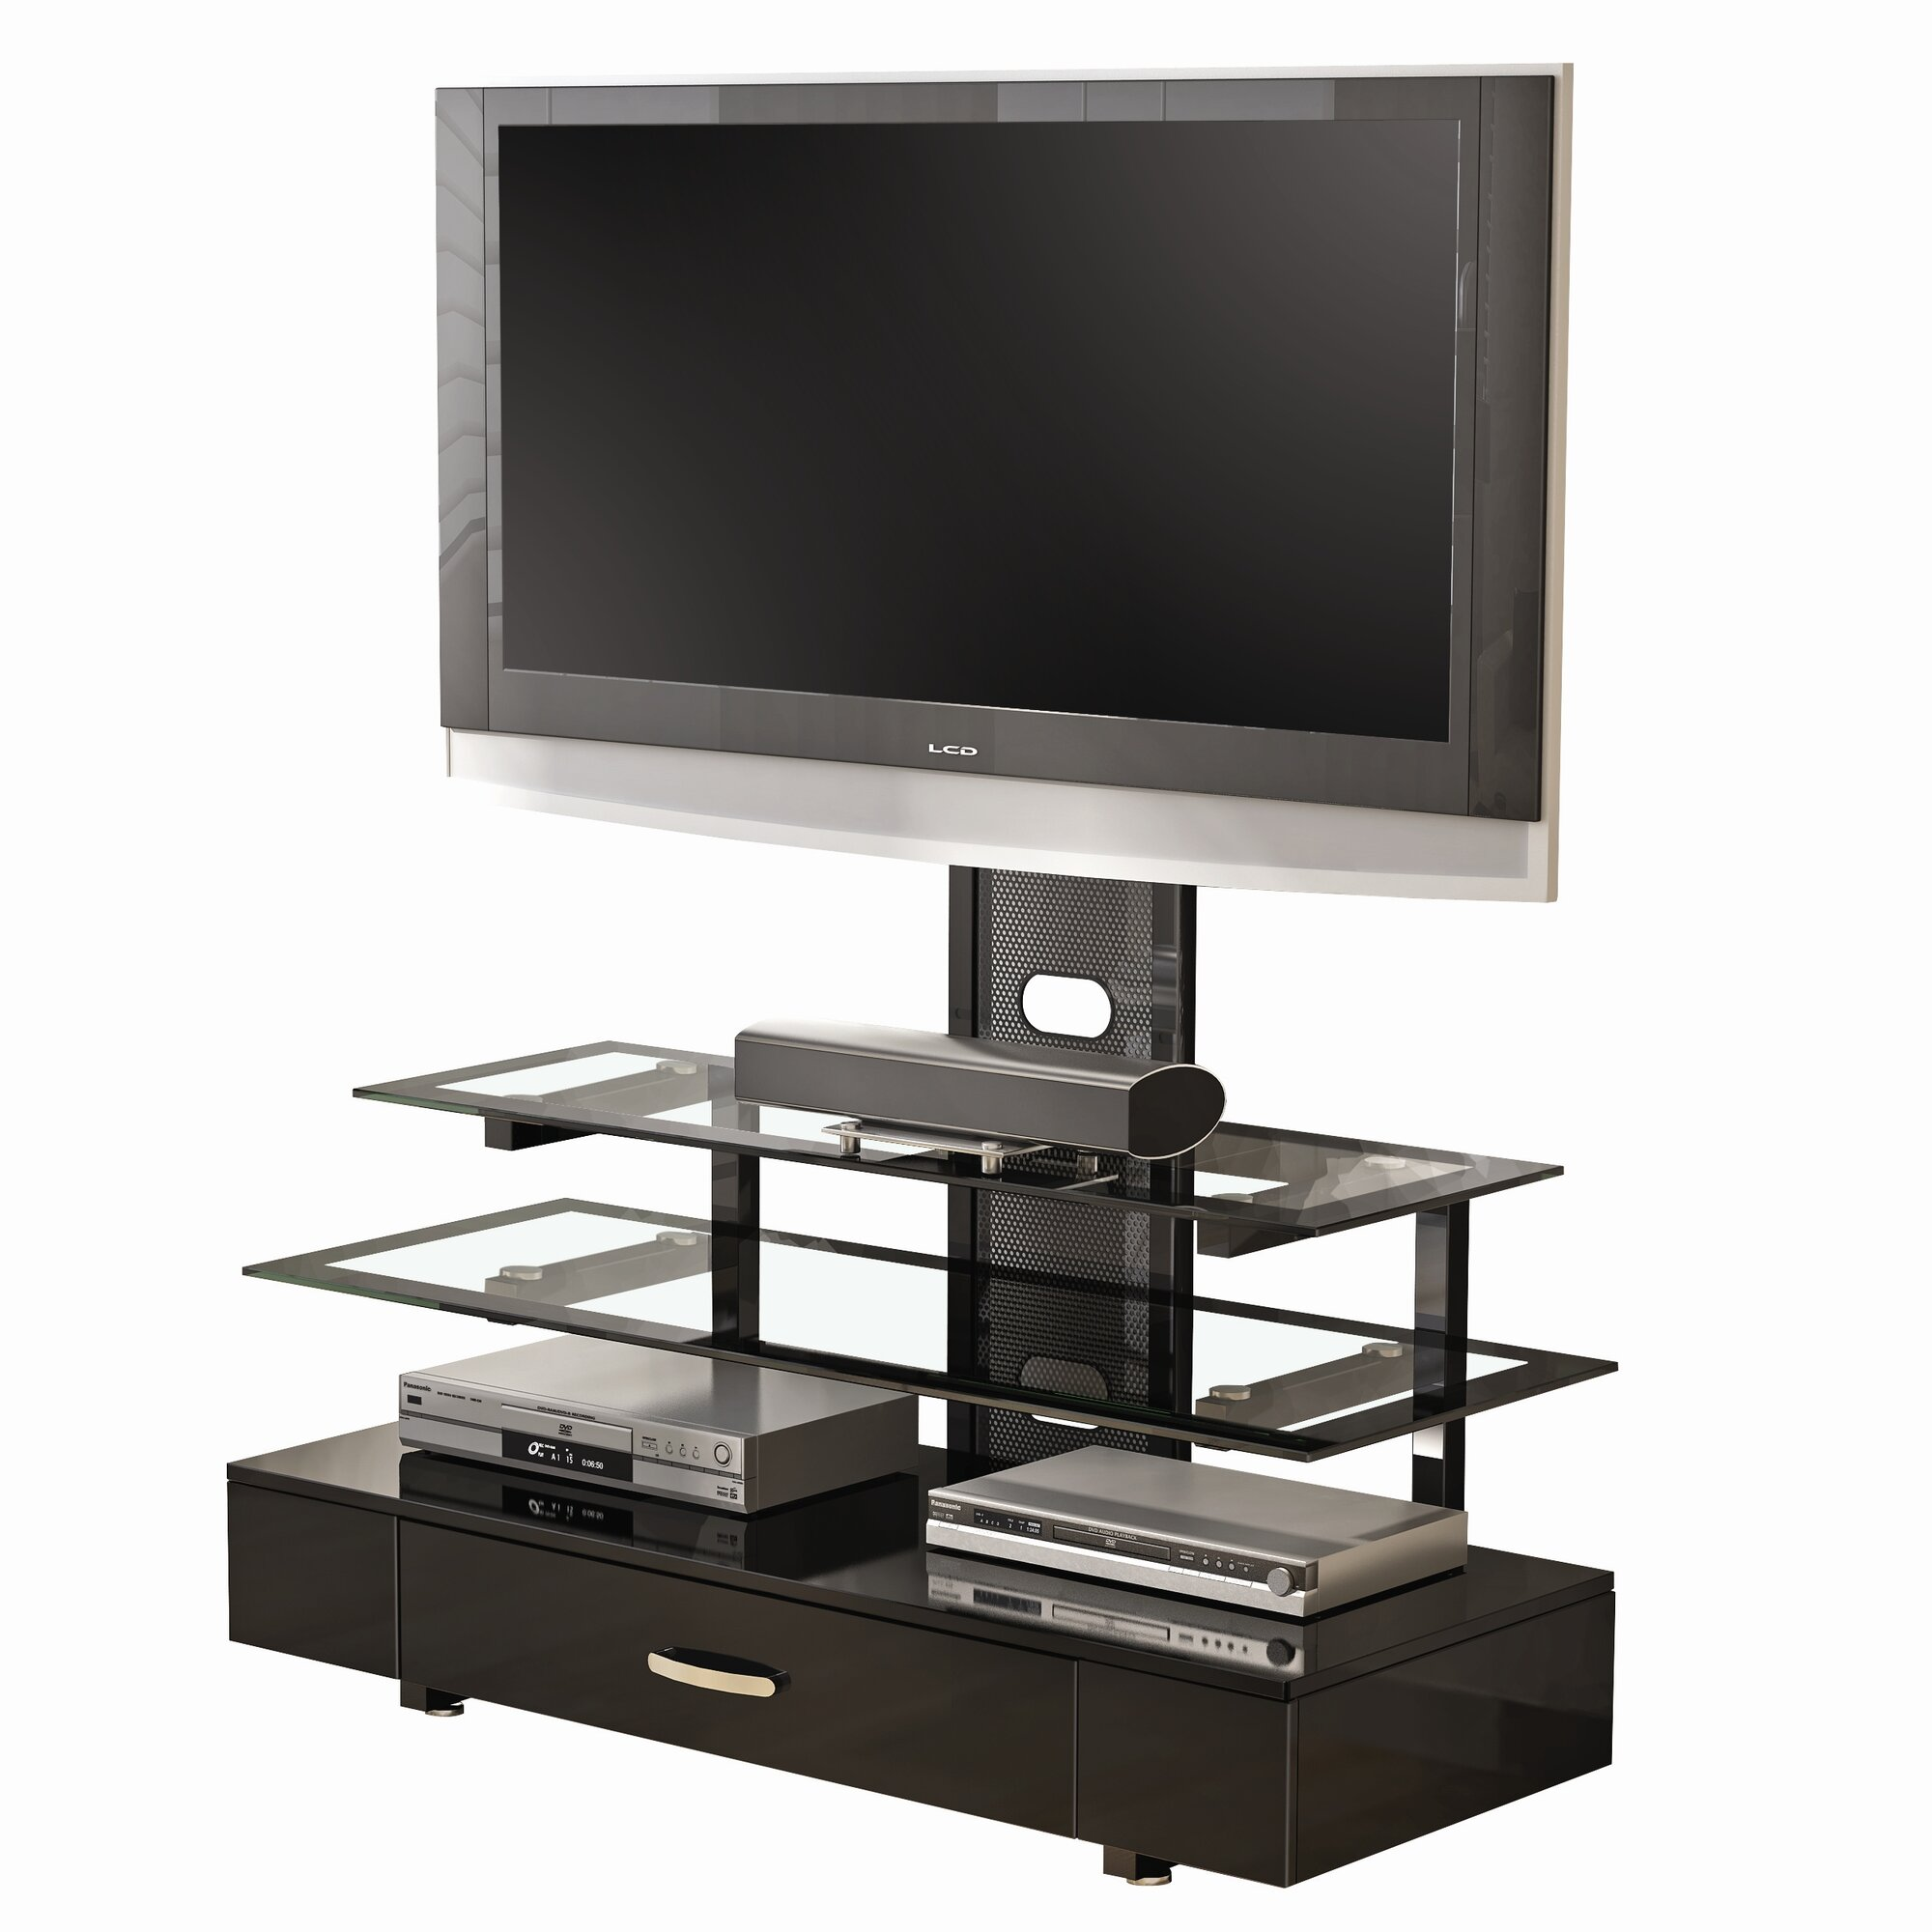 z line designs ambrie flat panel 3 in 1 tv mount system reviews wayfair. Black Bedroom Furniture Sets. Home Design Ideas